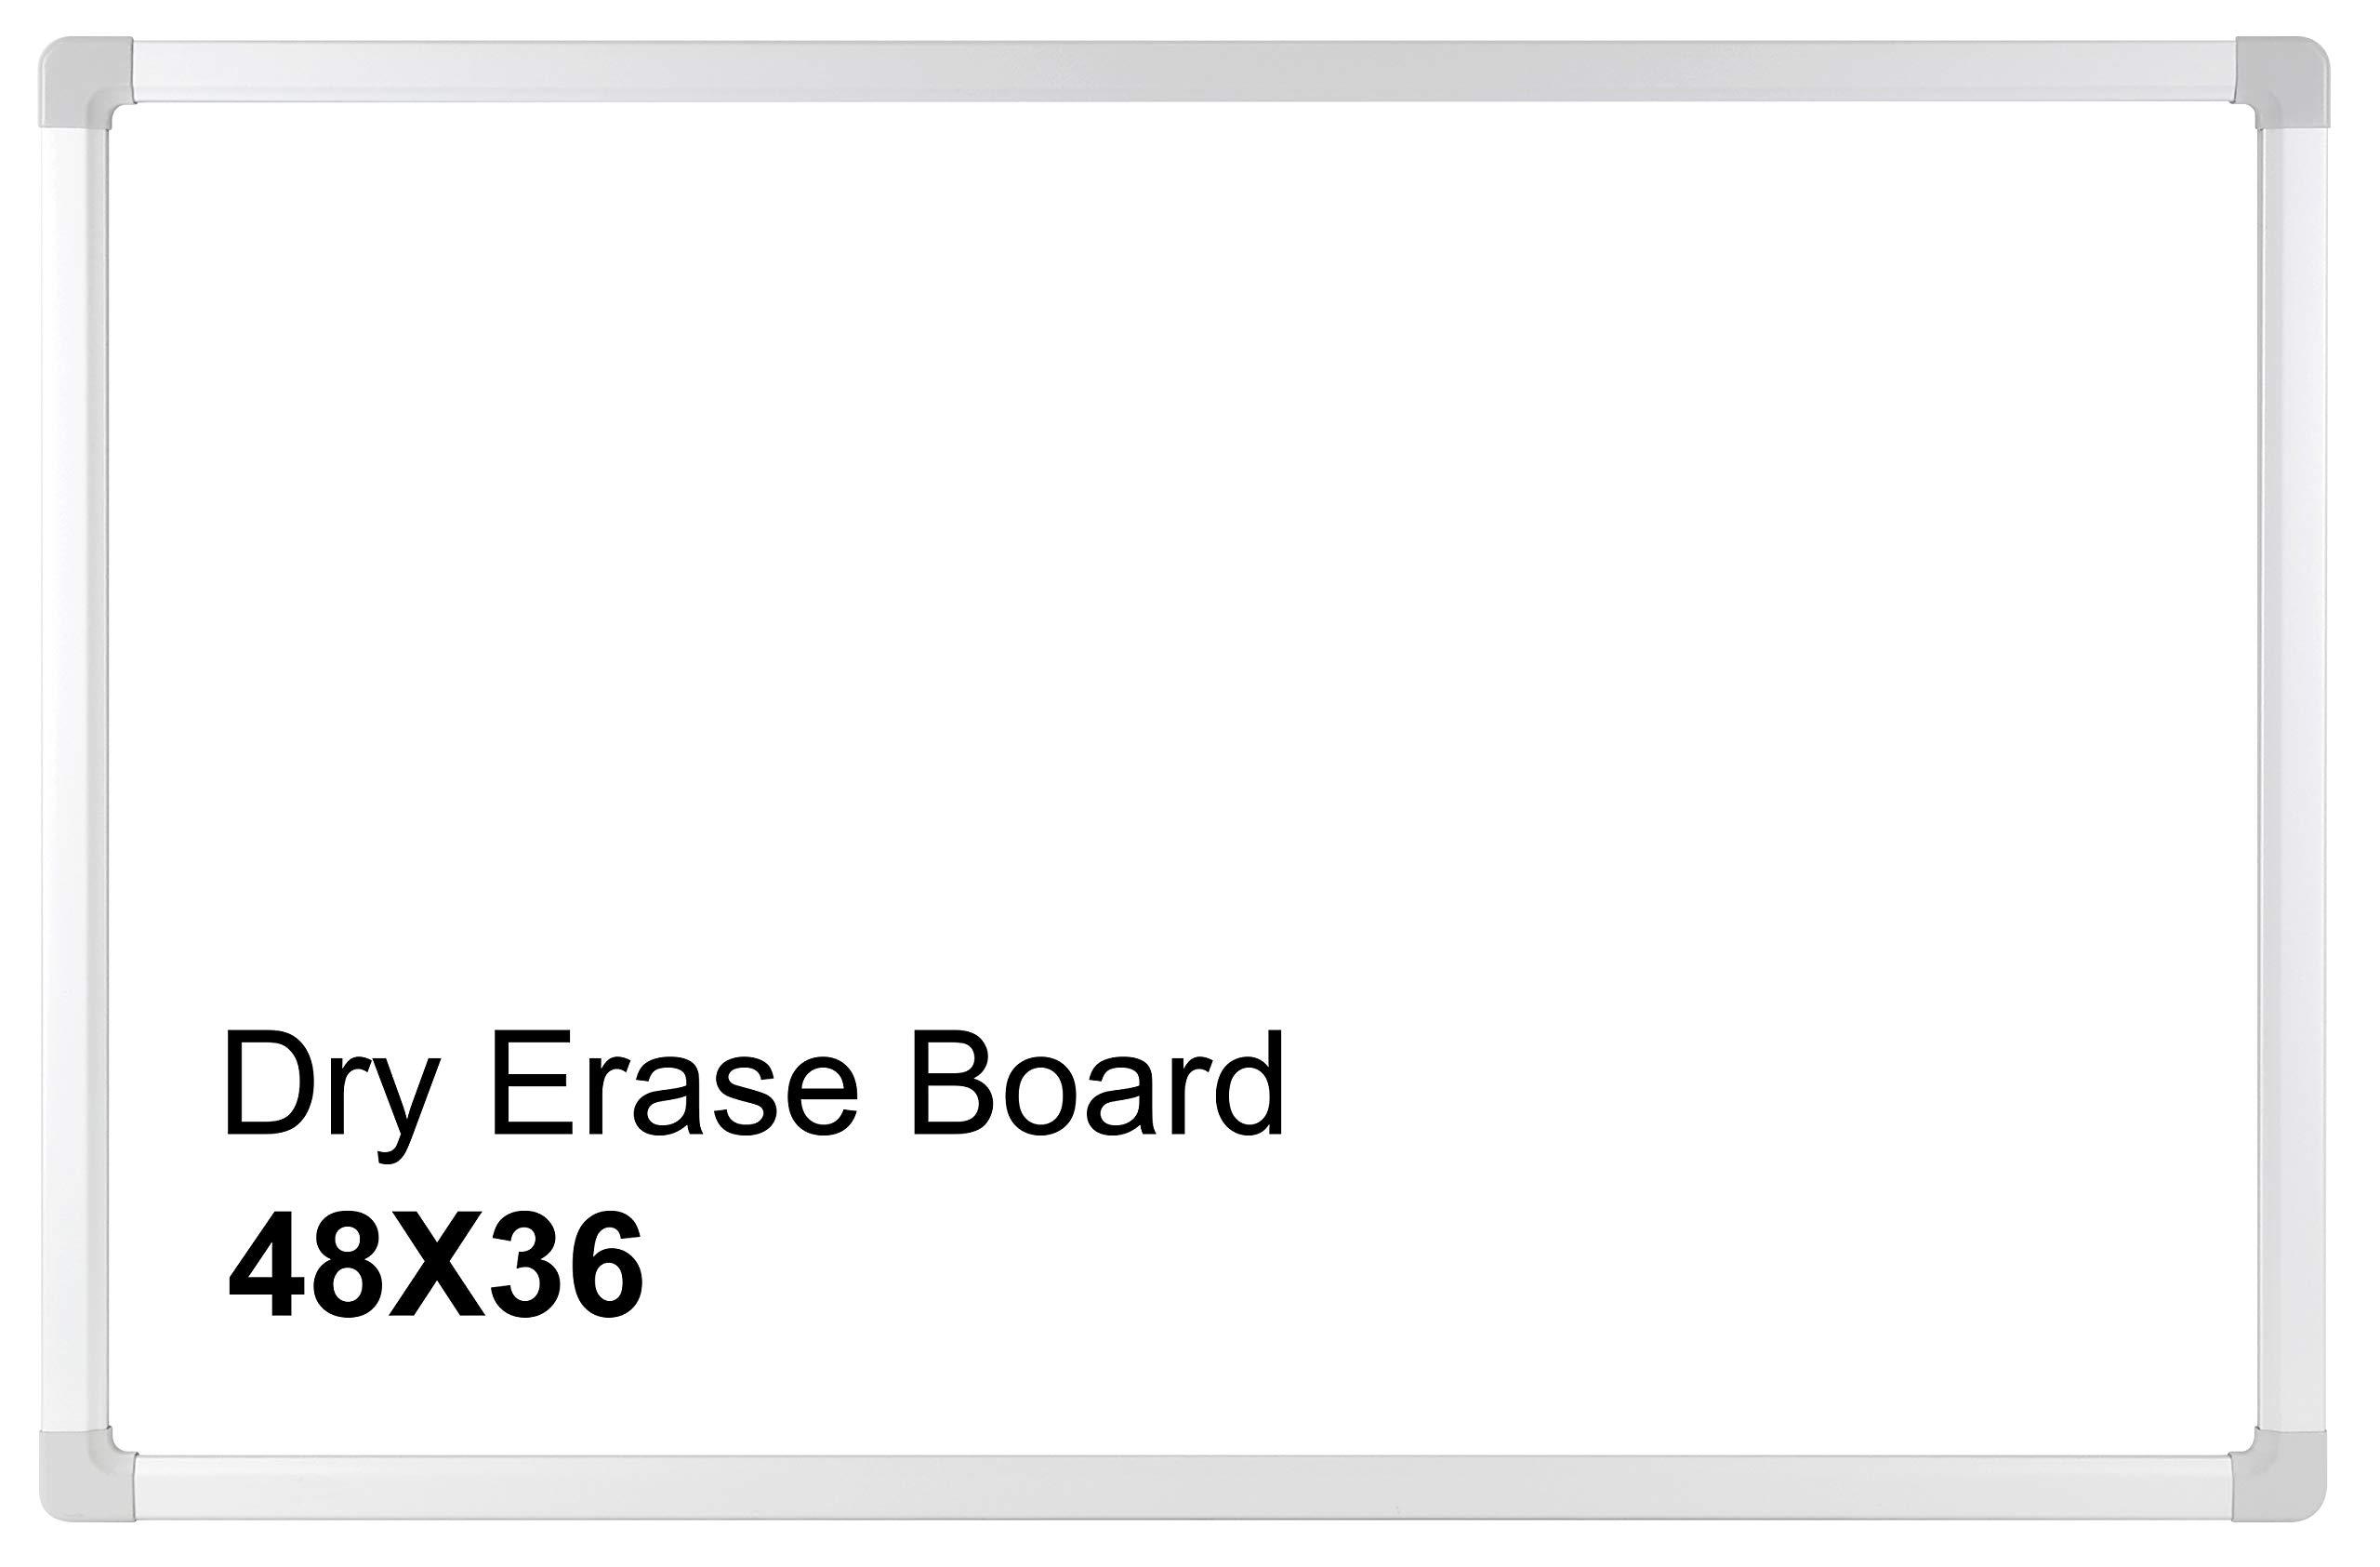 The Moon, Melamine Whiteboard/Dry Erase Board, Silver Aluminum Frame (48''x36''),1 Aluminum Marker Tray for School, Home, Office